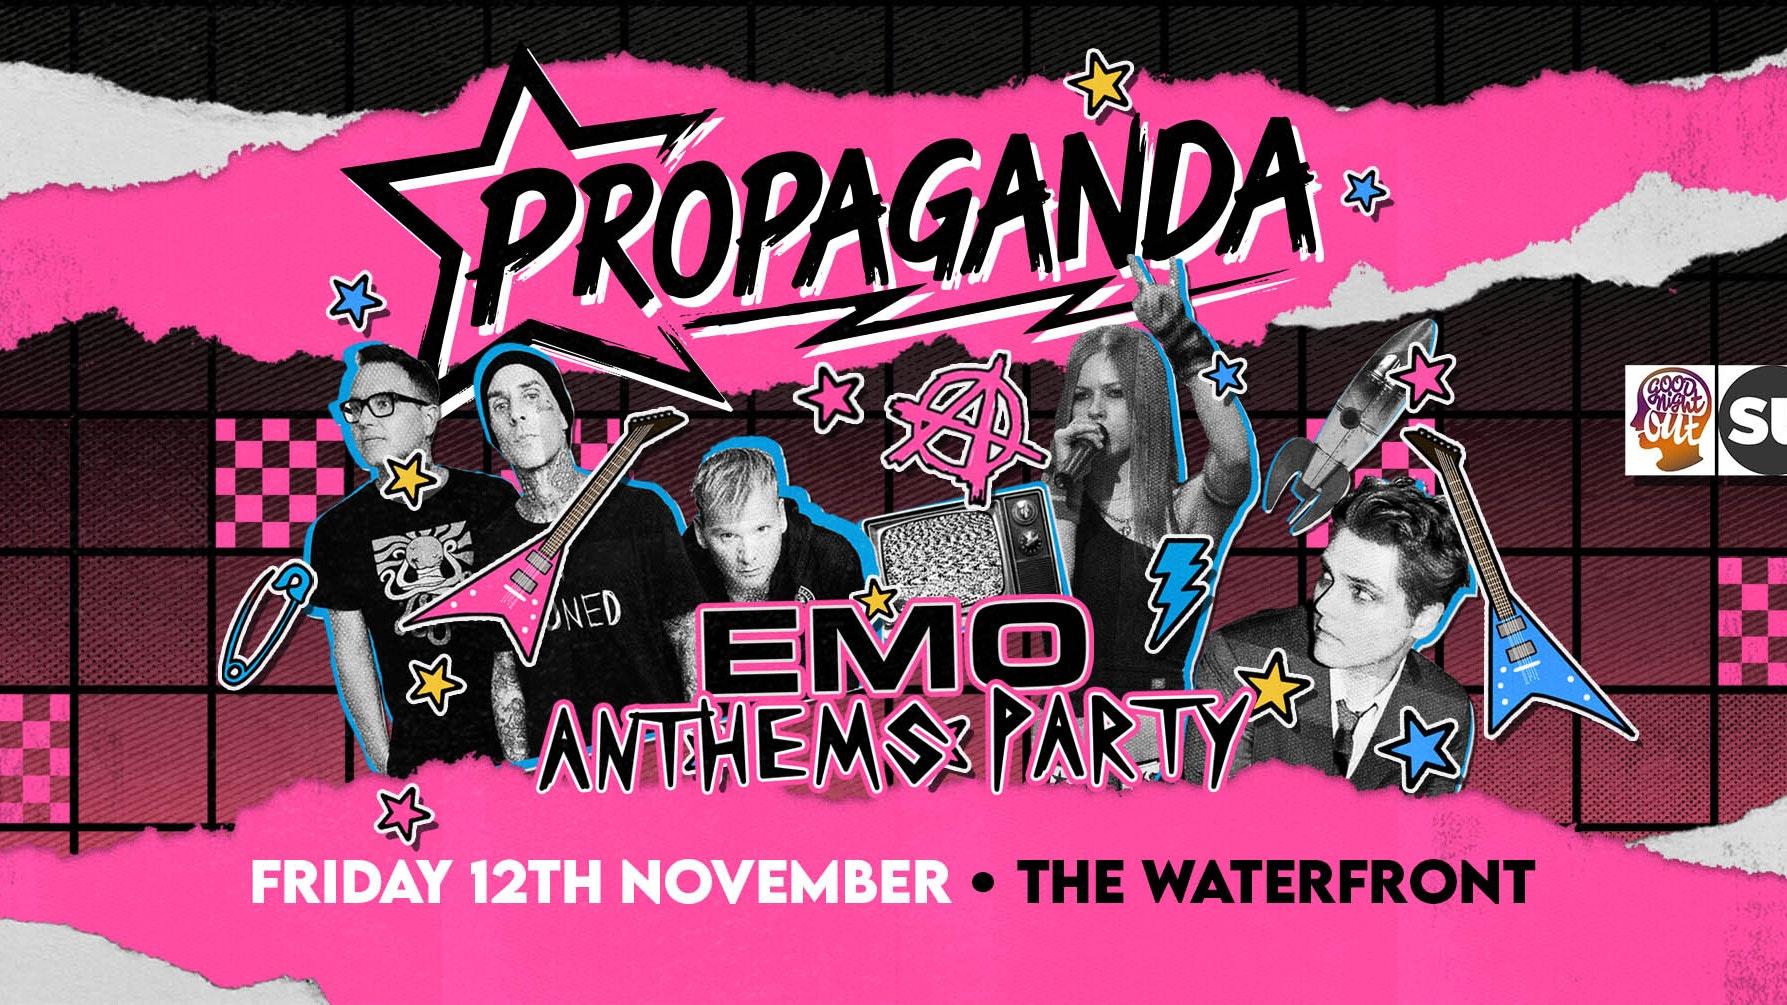 Propaganda Norwich – Emo Anthems Party!